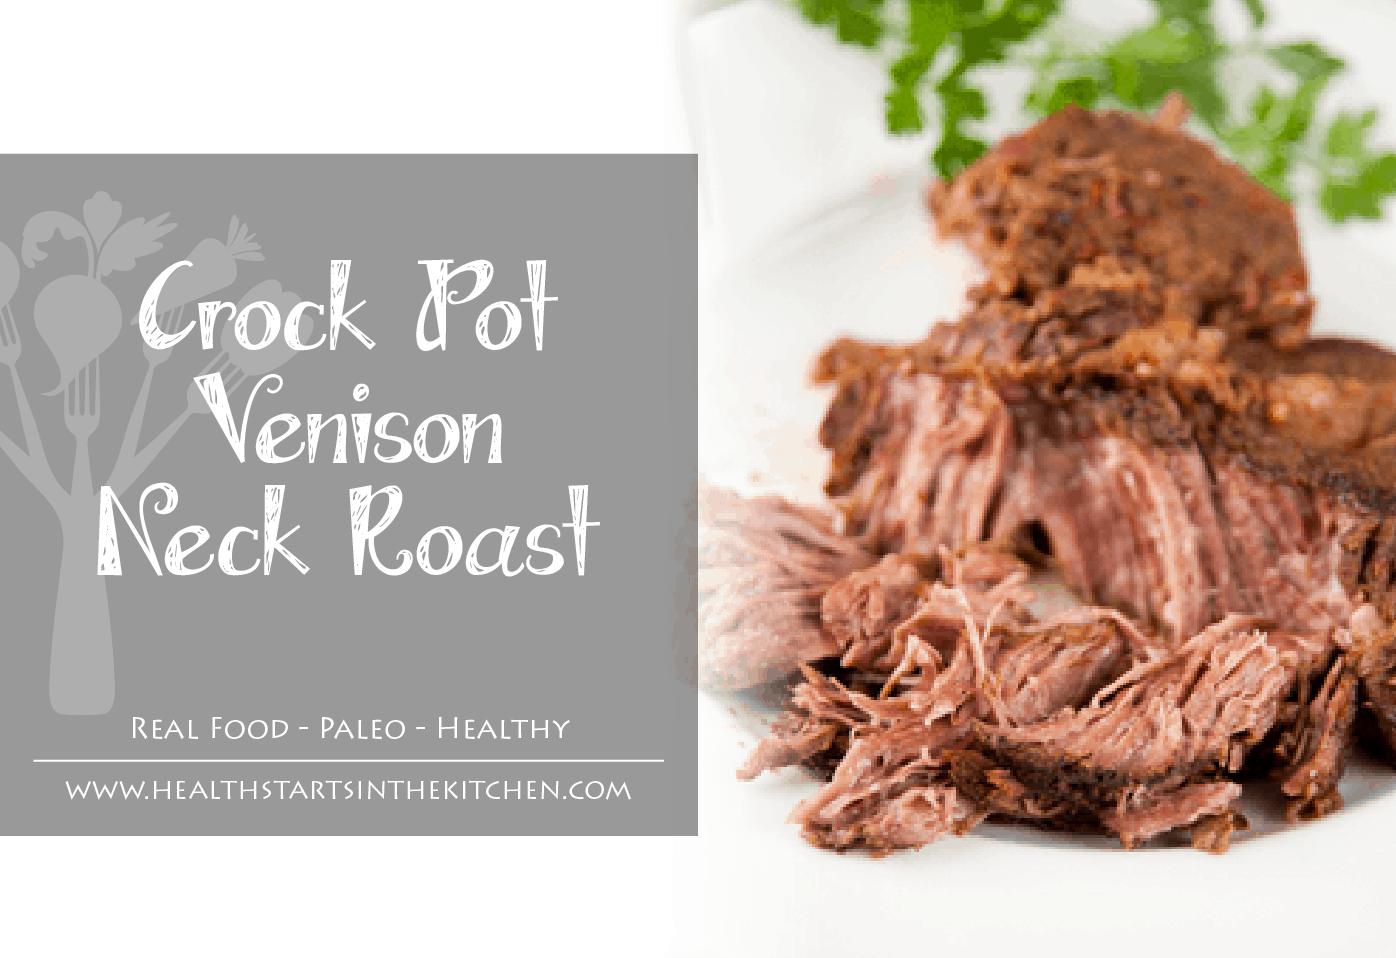 Crock Pot Venison Neck Roast